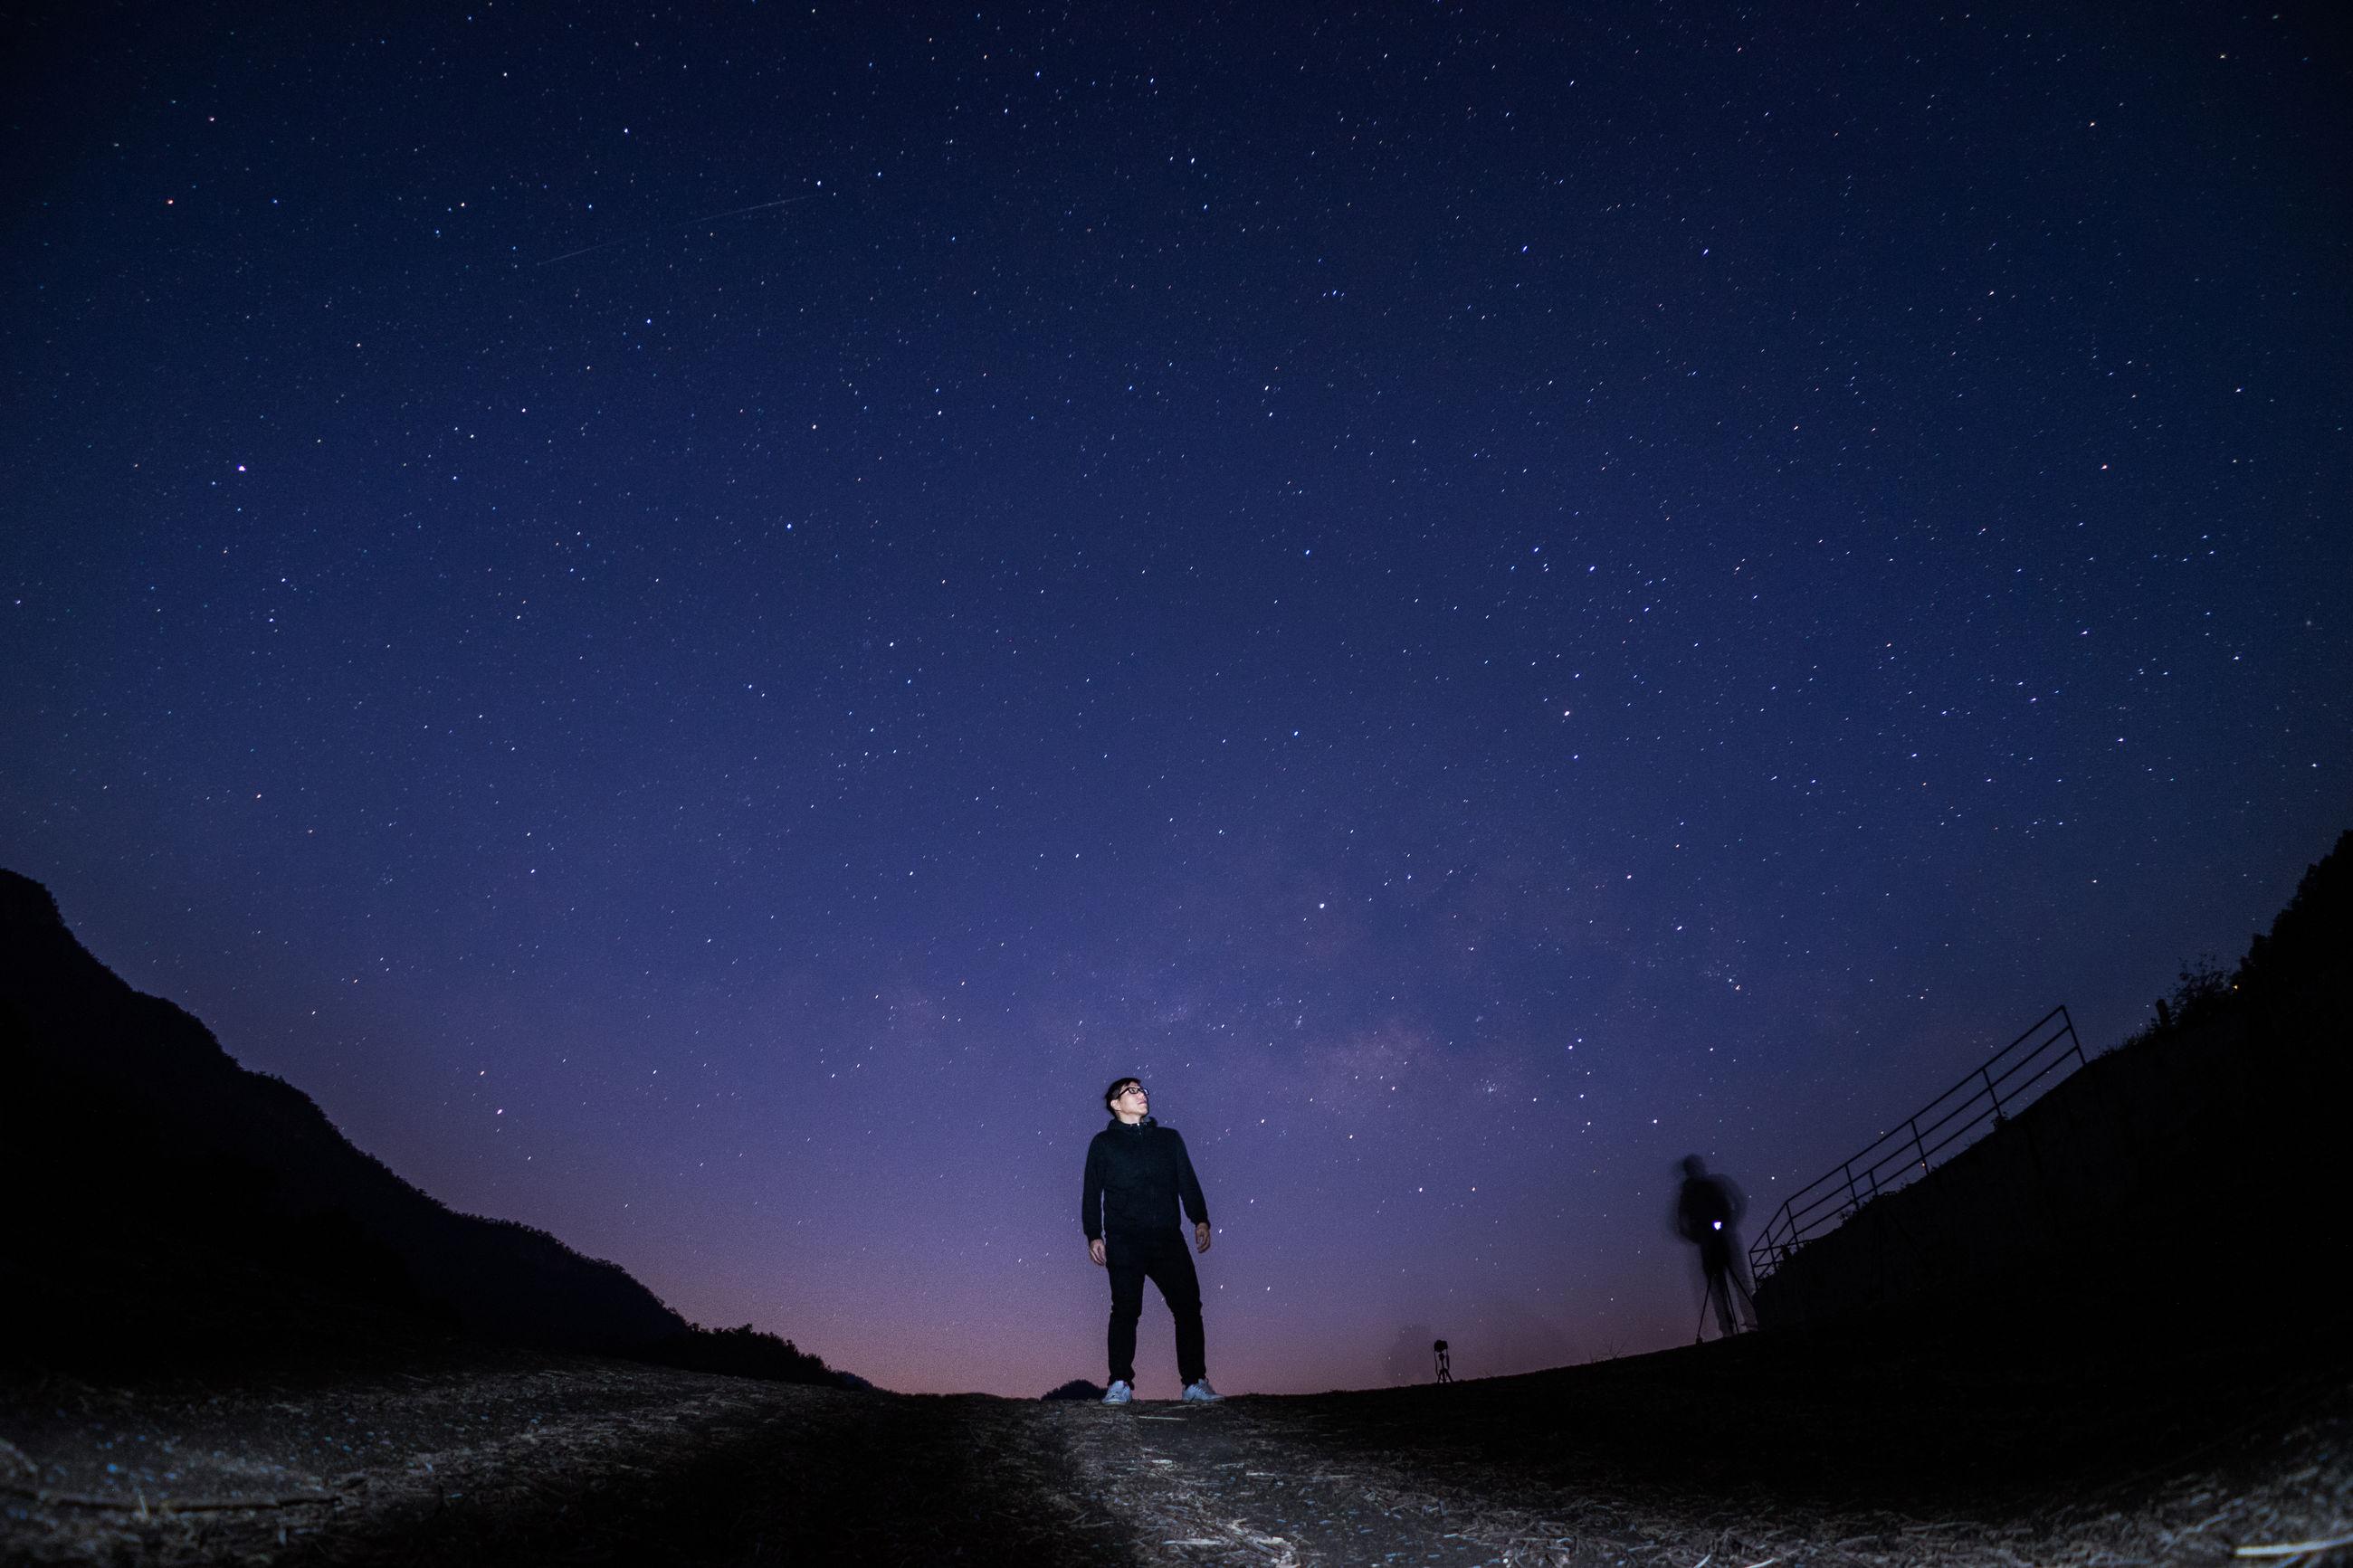 Full length of man walking against star field at night